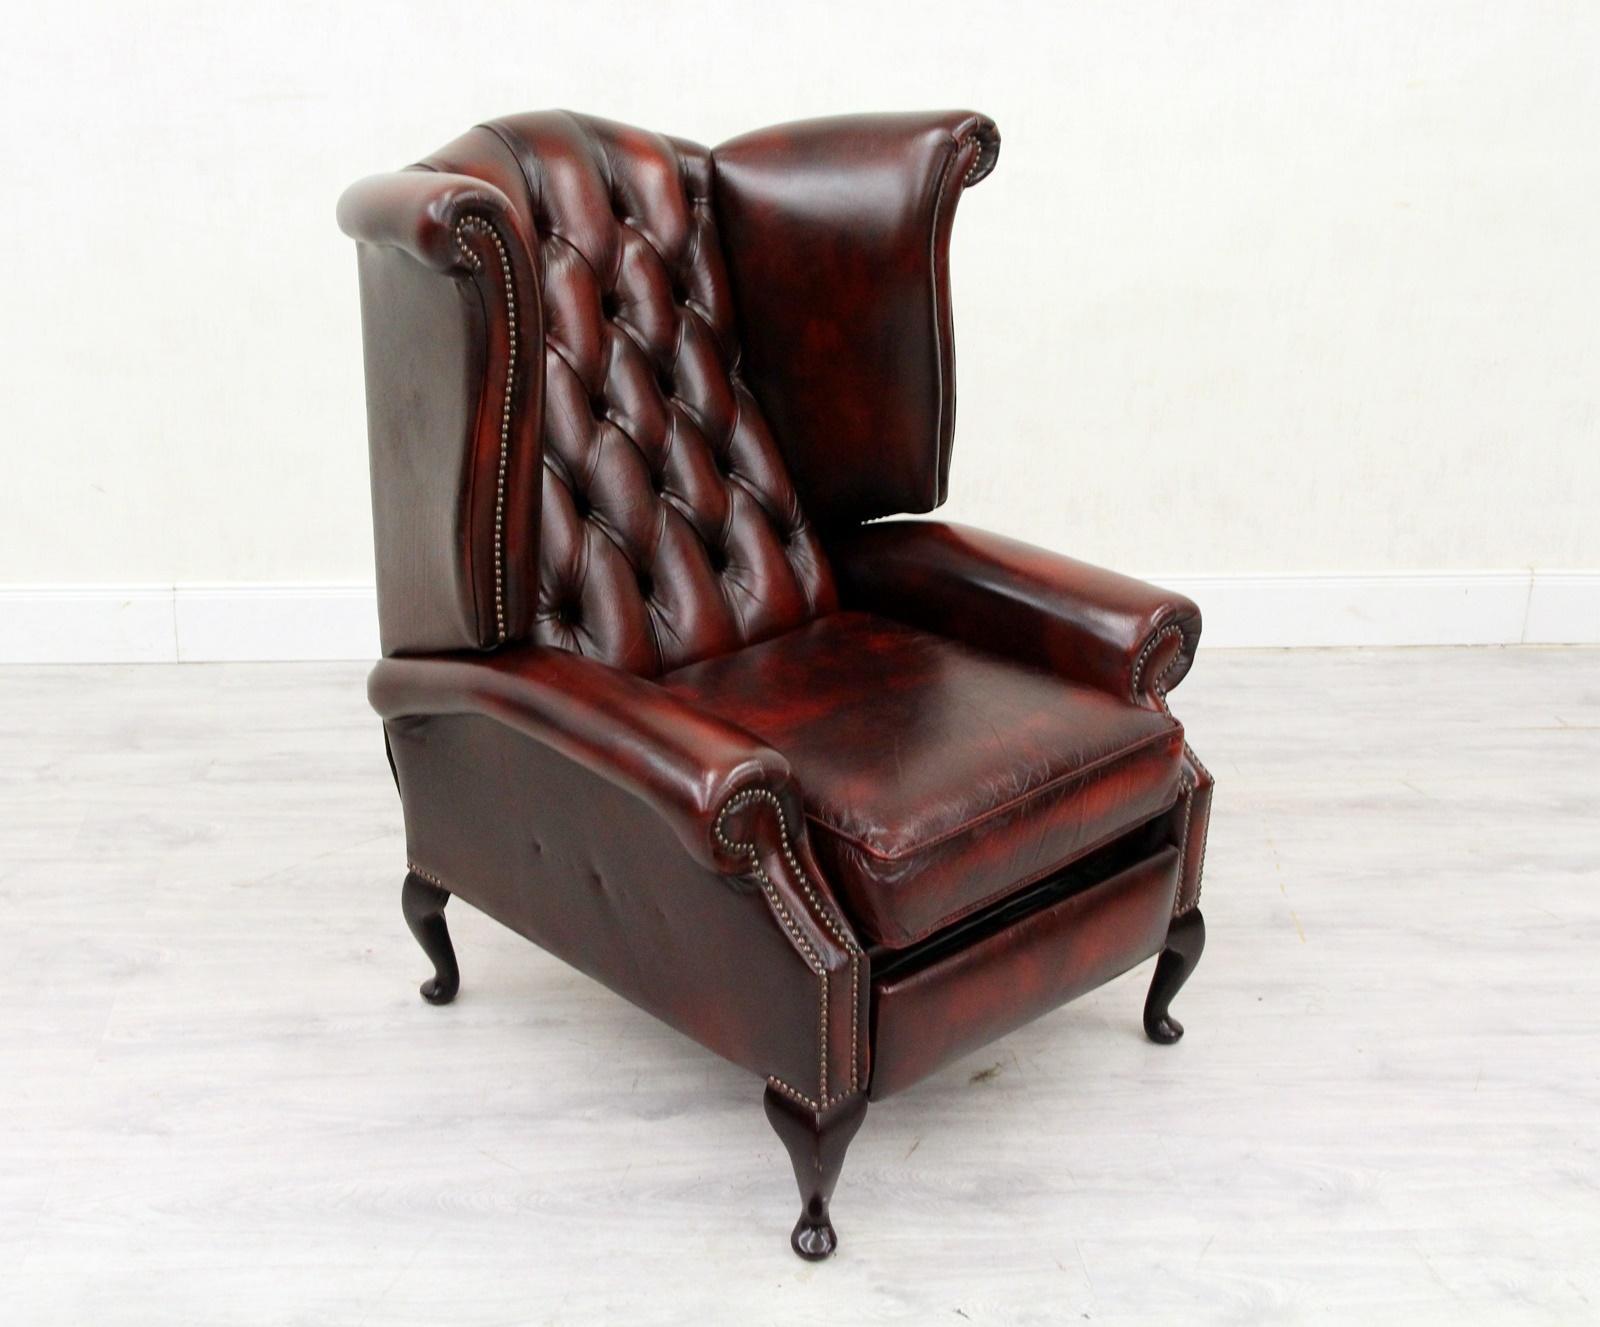 Reproduction Sofas/chaises Sofas/chaises French Armchair Baroque Chair Livingroom Furniture Fine Workmanship